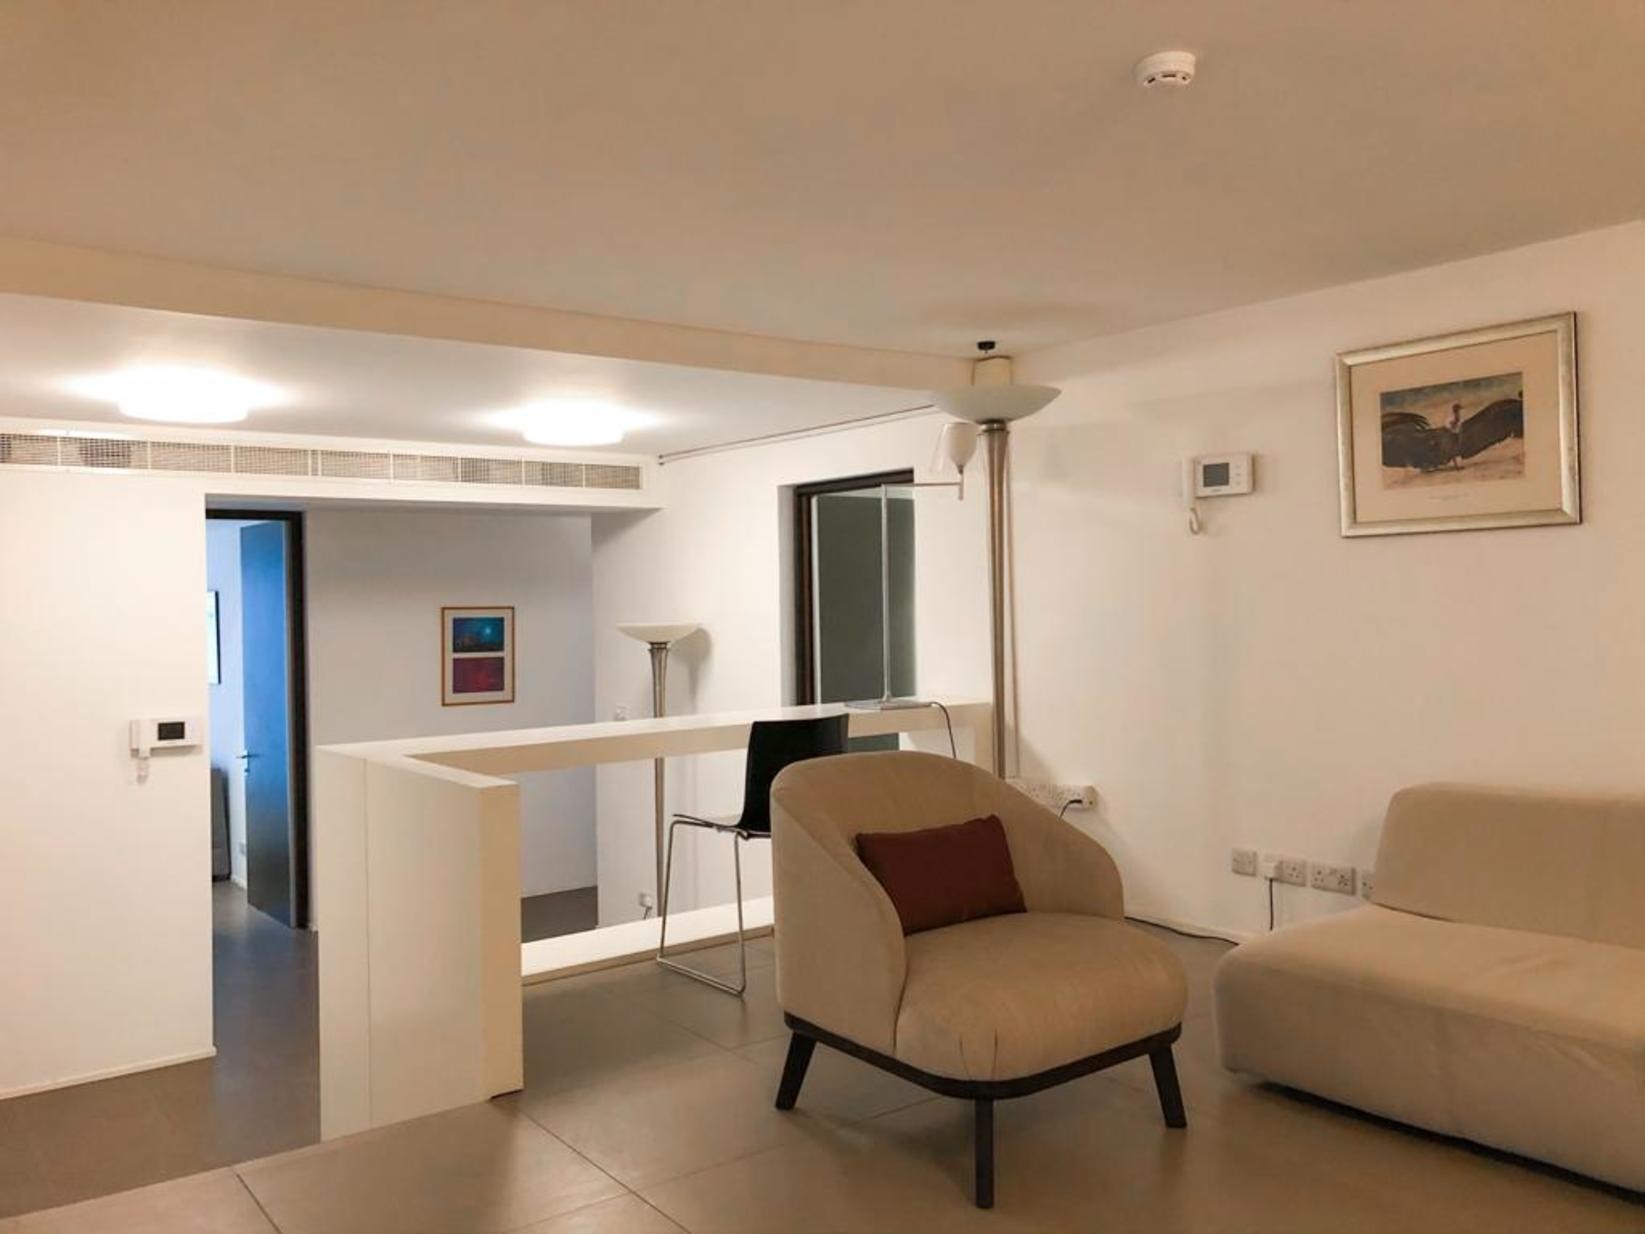 3 bed Villa For Rent in Bahar ic-Caghaq, Bahar ic-Caghaq - thumb 26